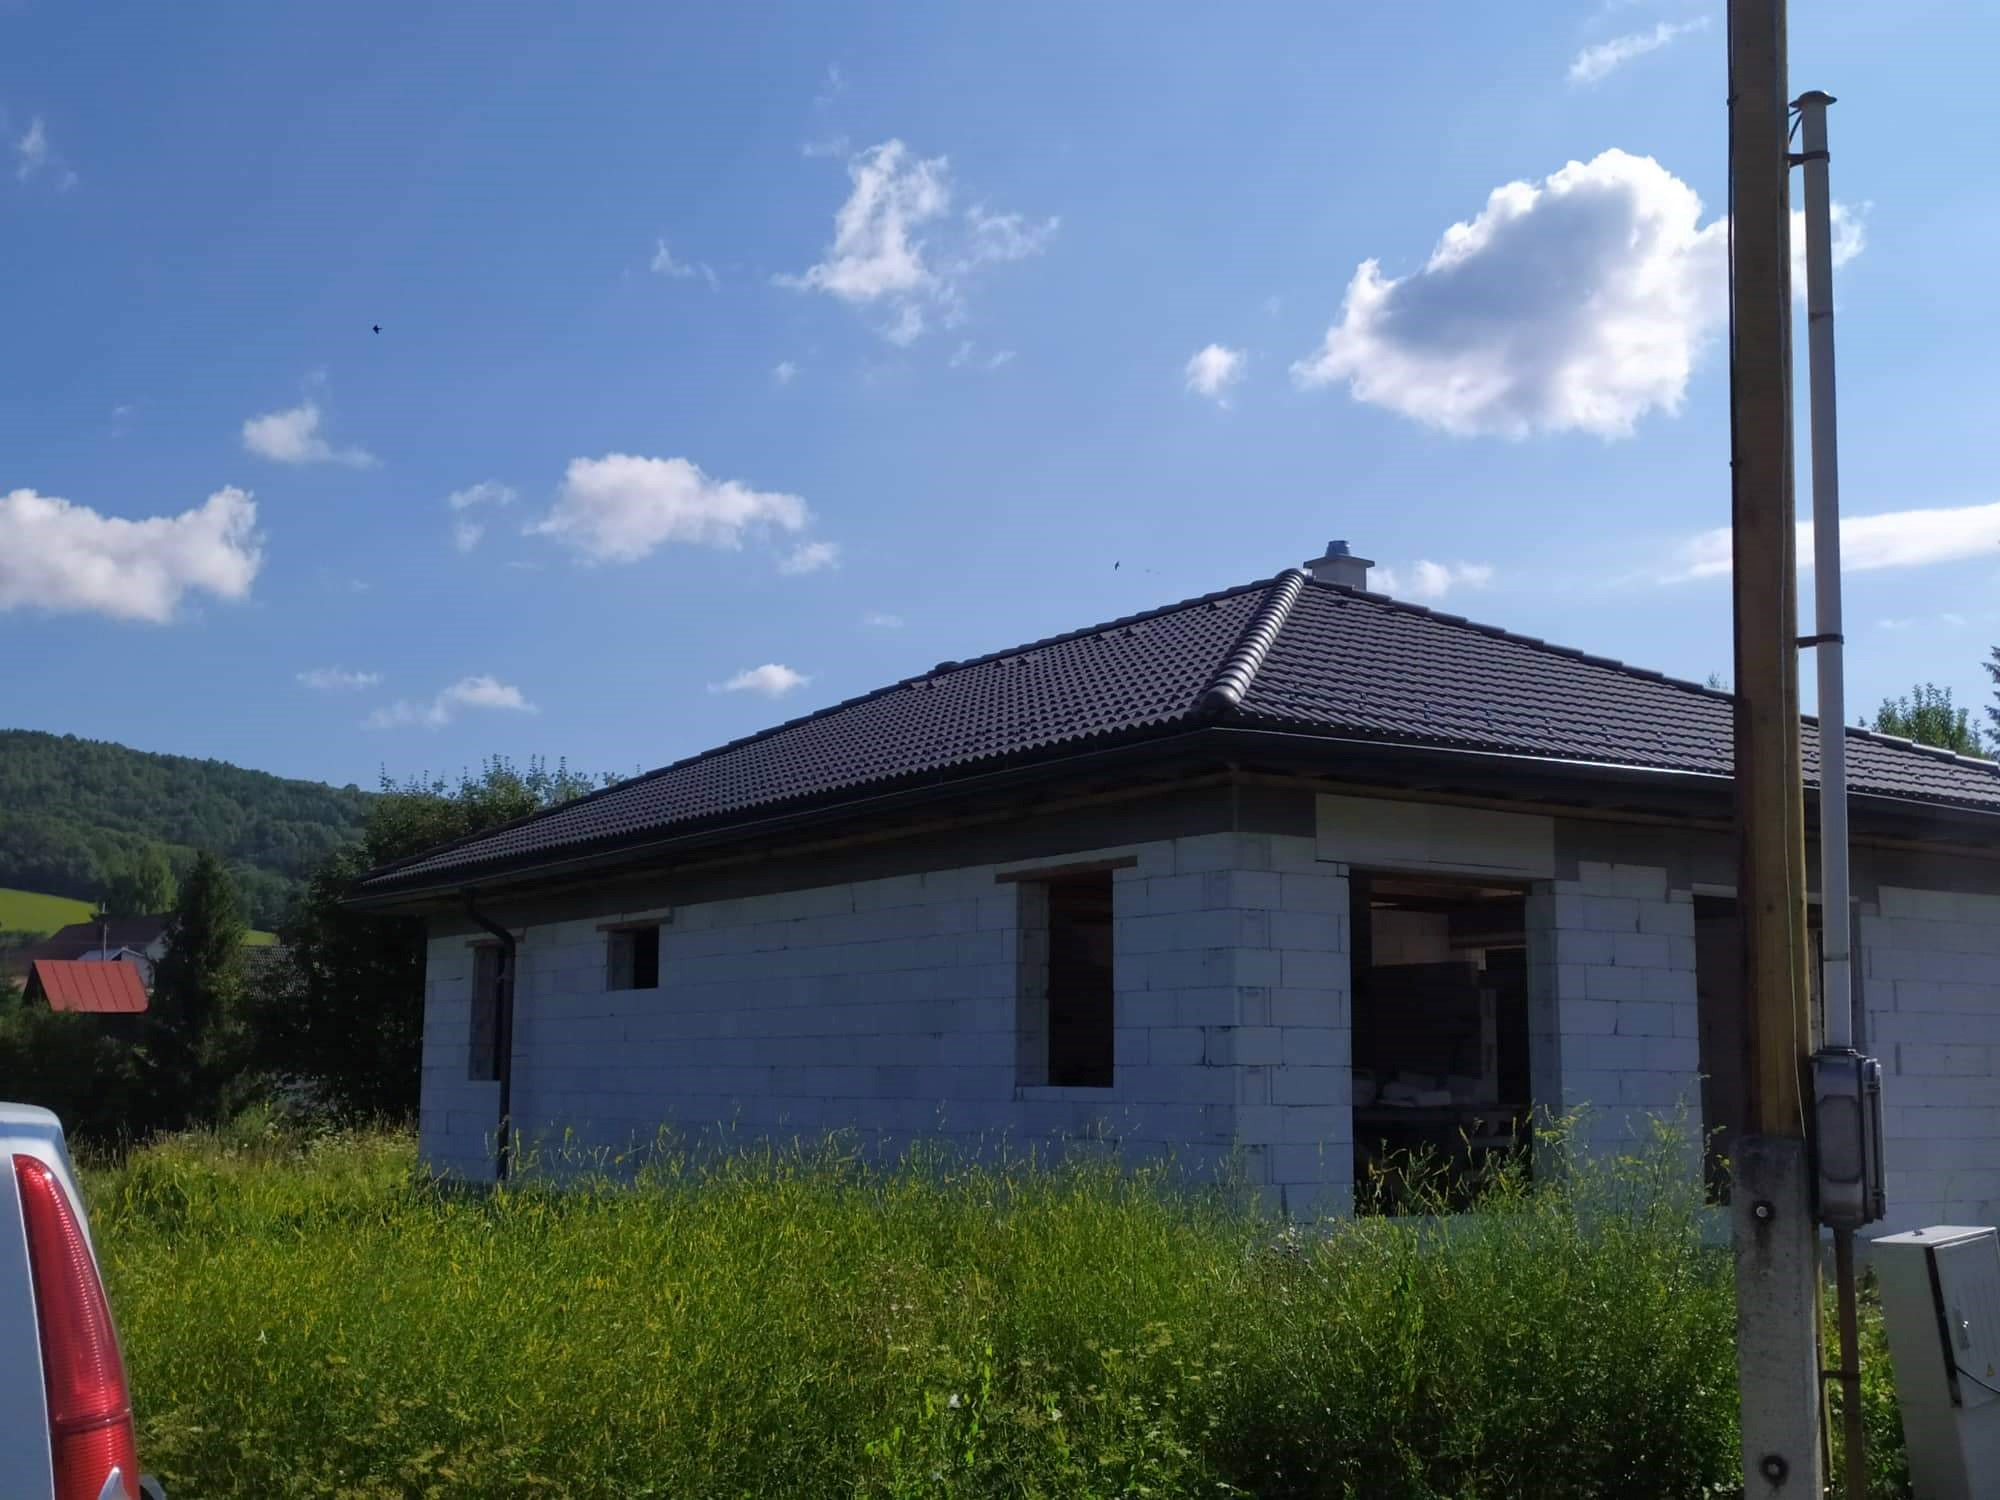 valbova strecha terran